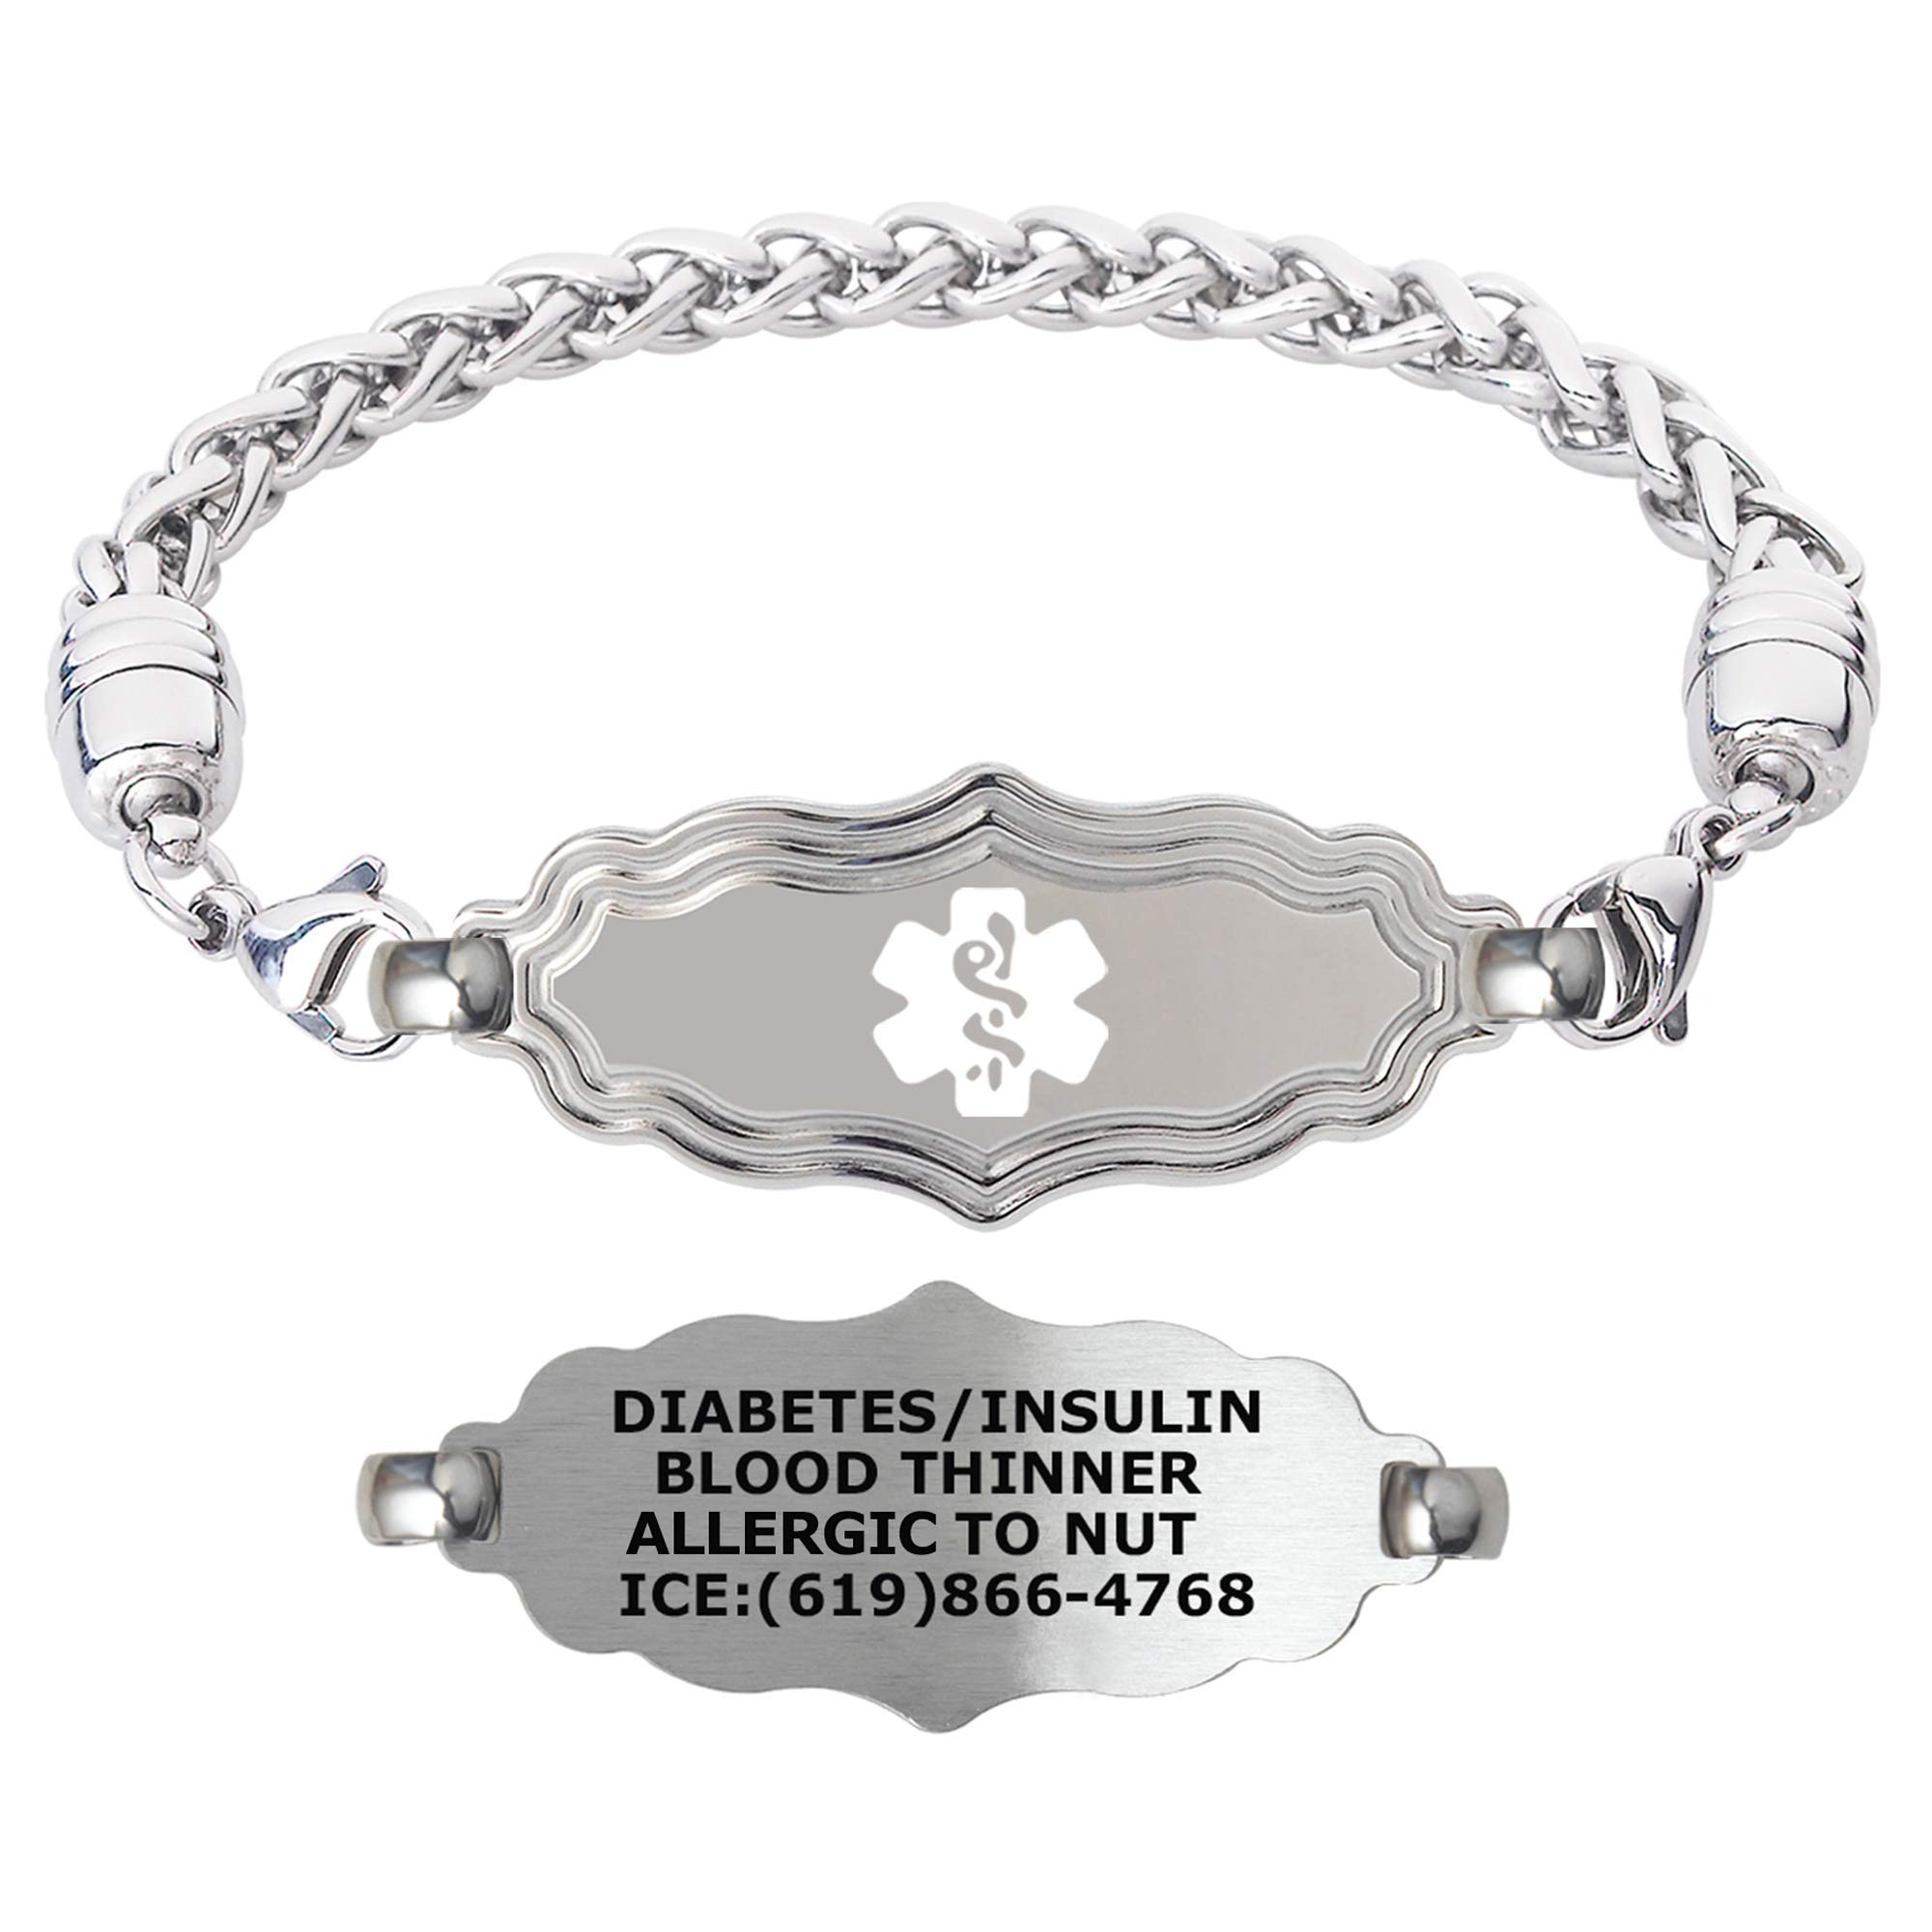 Divoti Custom Engraved Medical Alert Bracelets for Women, Stainless Steel Medical Bracelet, Medical ID Bracelet w/Free Engraving – Victorian Art Deco Tag w/Wheat – Color/Size